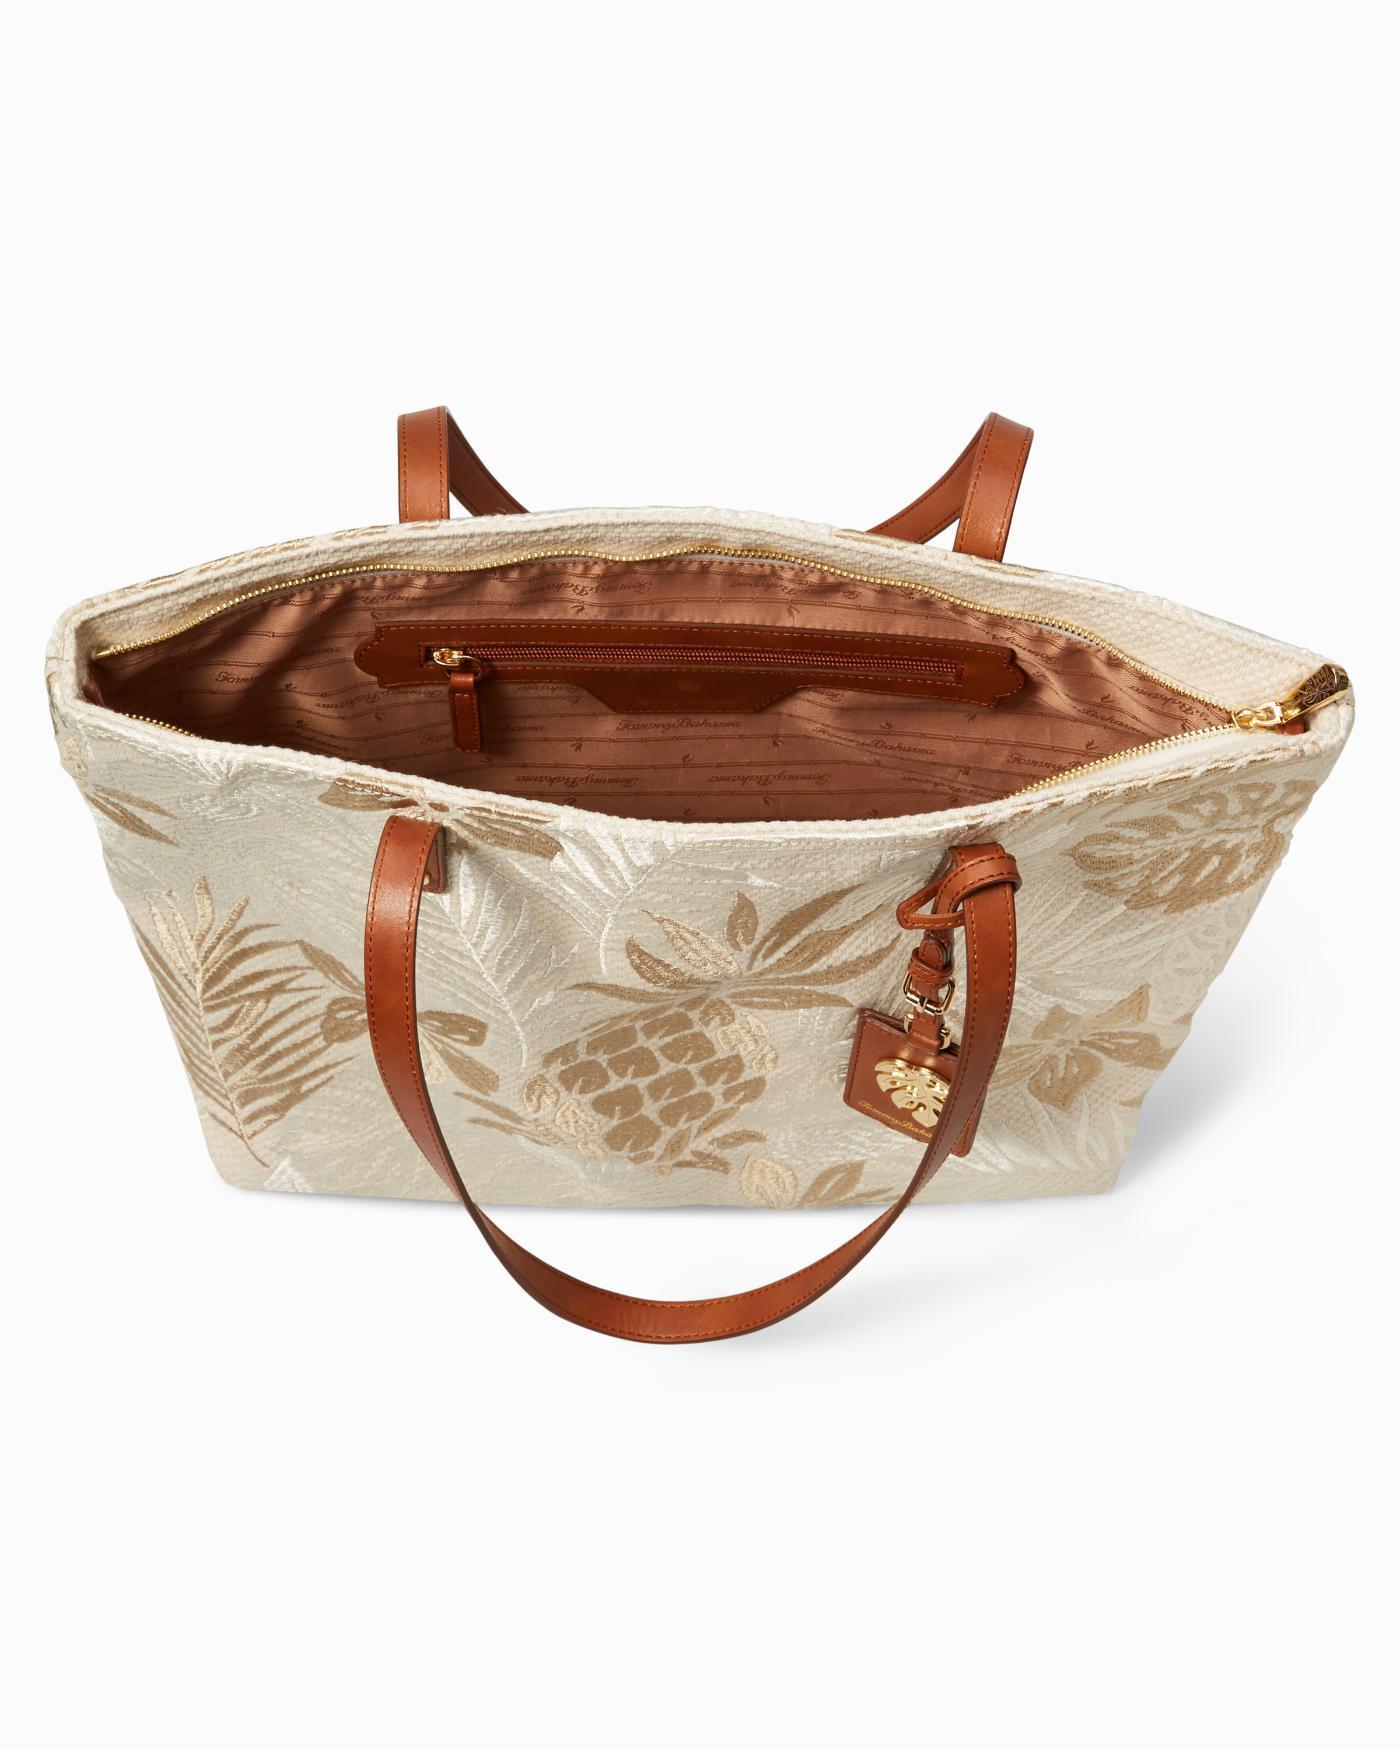 Rare Tommy Bahama Handbag Bag Burnt Orange Embroidered Pineapples Leather